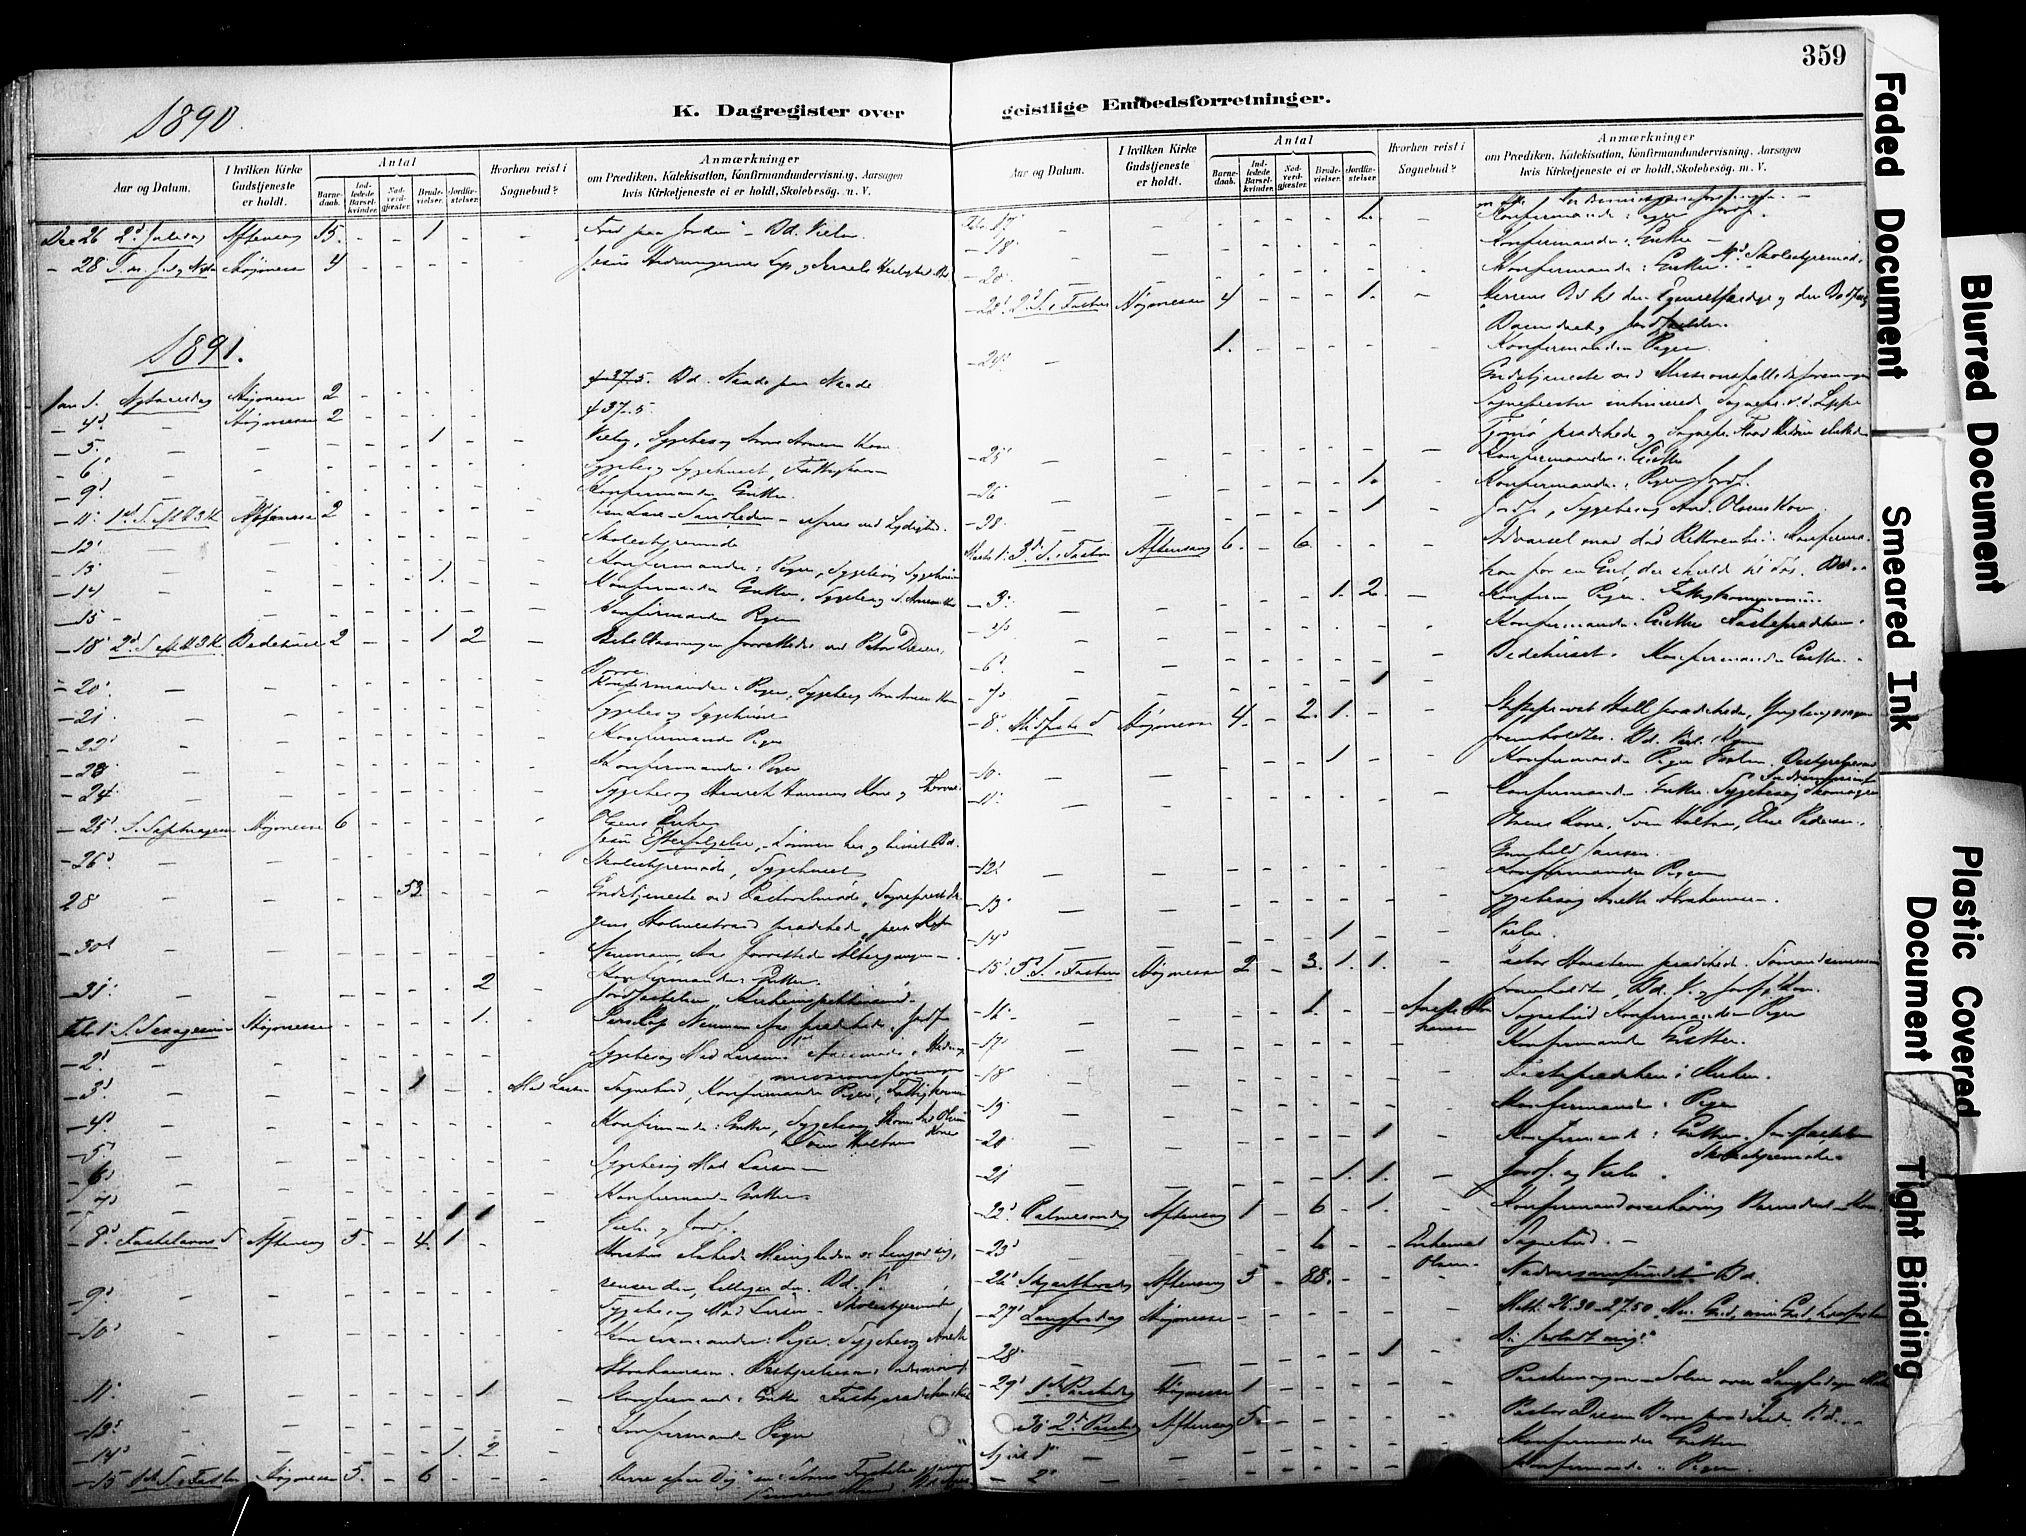 SAKO, Horten kirkebøker, F/Fa/L0004: Parish register (official) no. 4, 1888-1895, p. 359